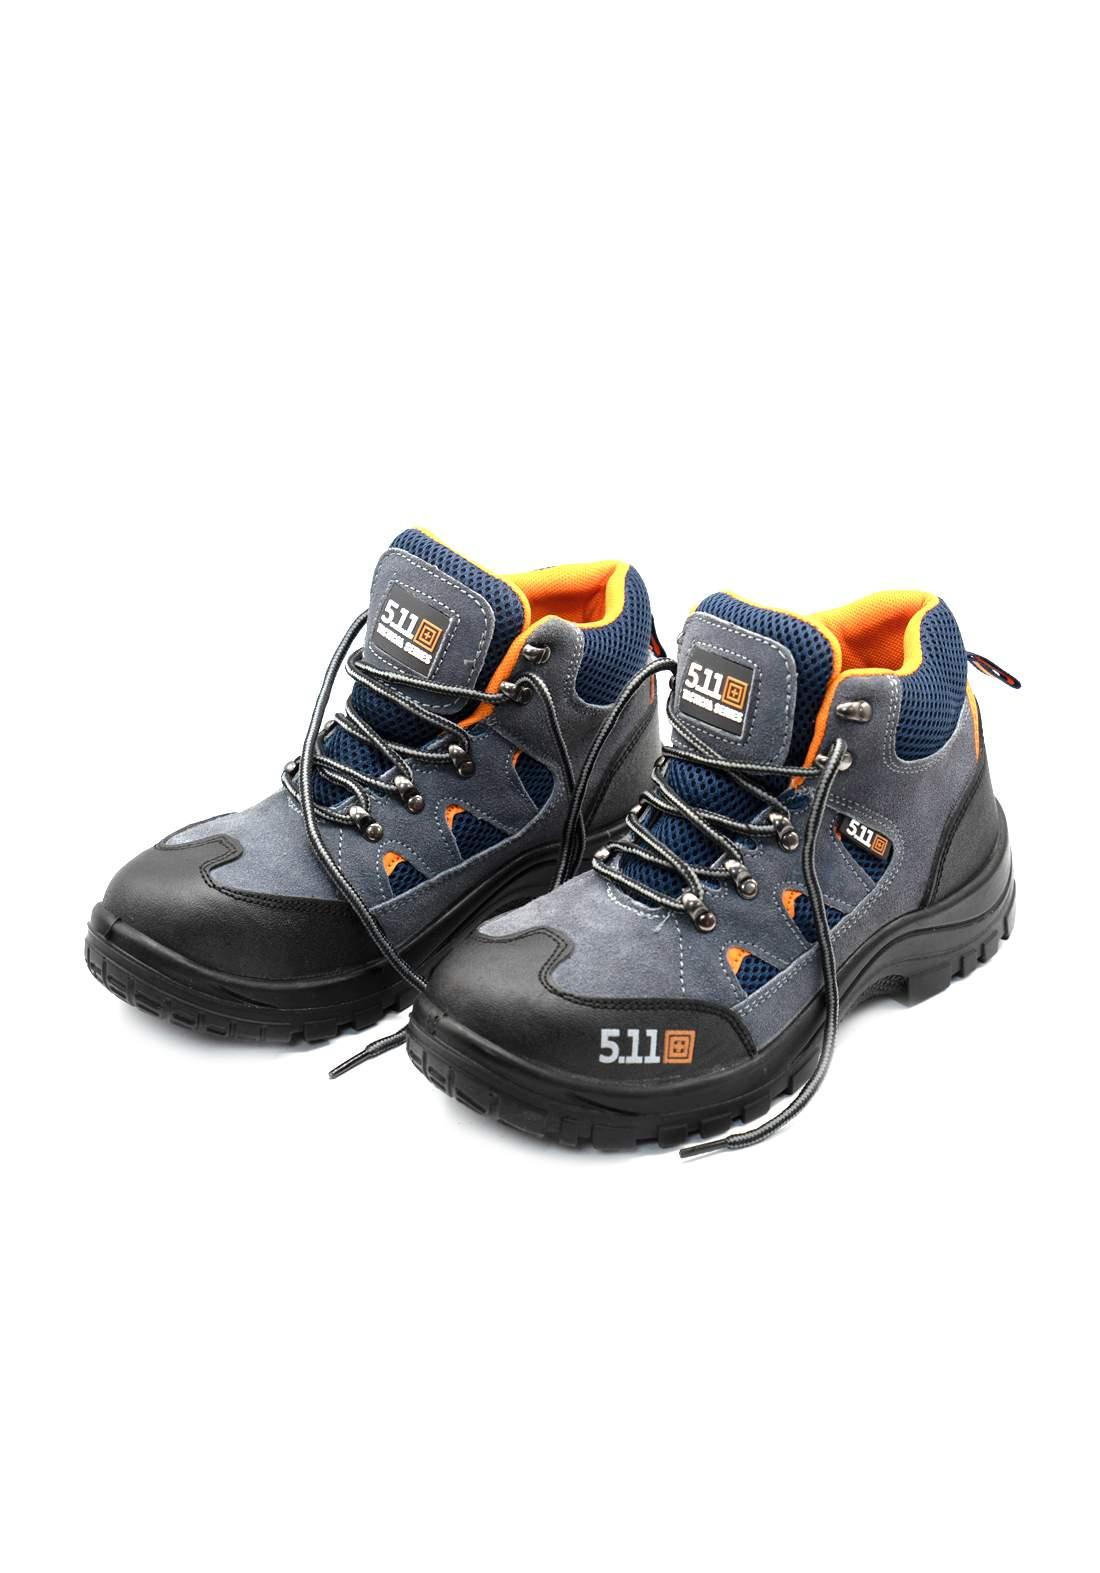 Subul Alhurra Safety Shoes Low Cut  Gray حذاء السلامة للعمل